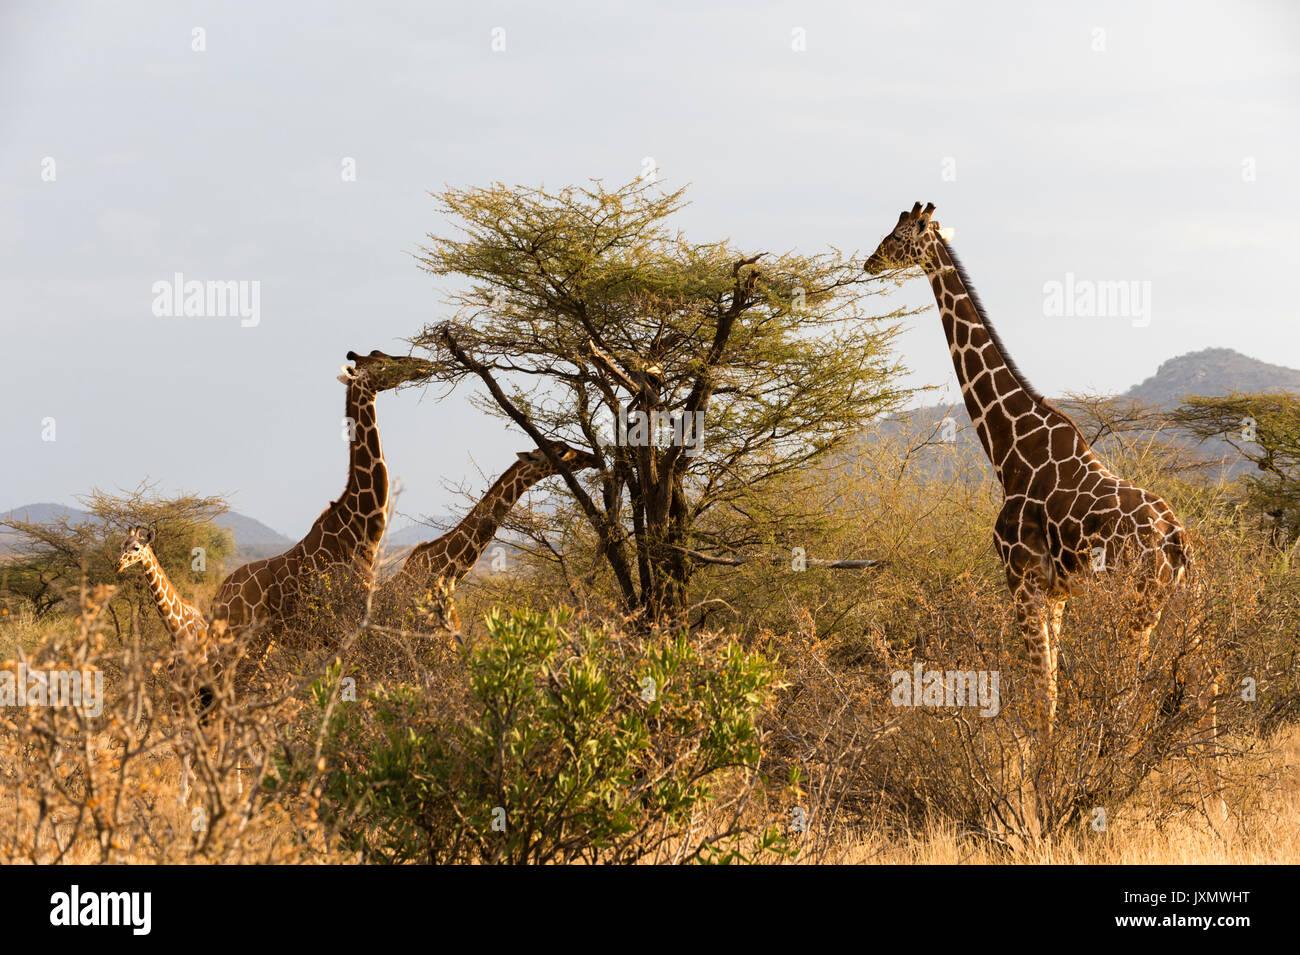 Reticulated giraffe (Giraffa camelopardalis reticulata), Kalama Wildlife Conservancy, Samburu, Kenya, Africa - Stock Image